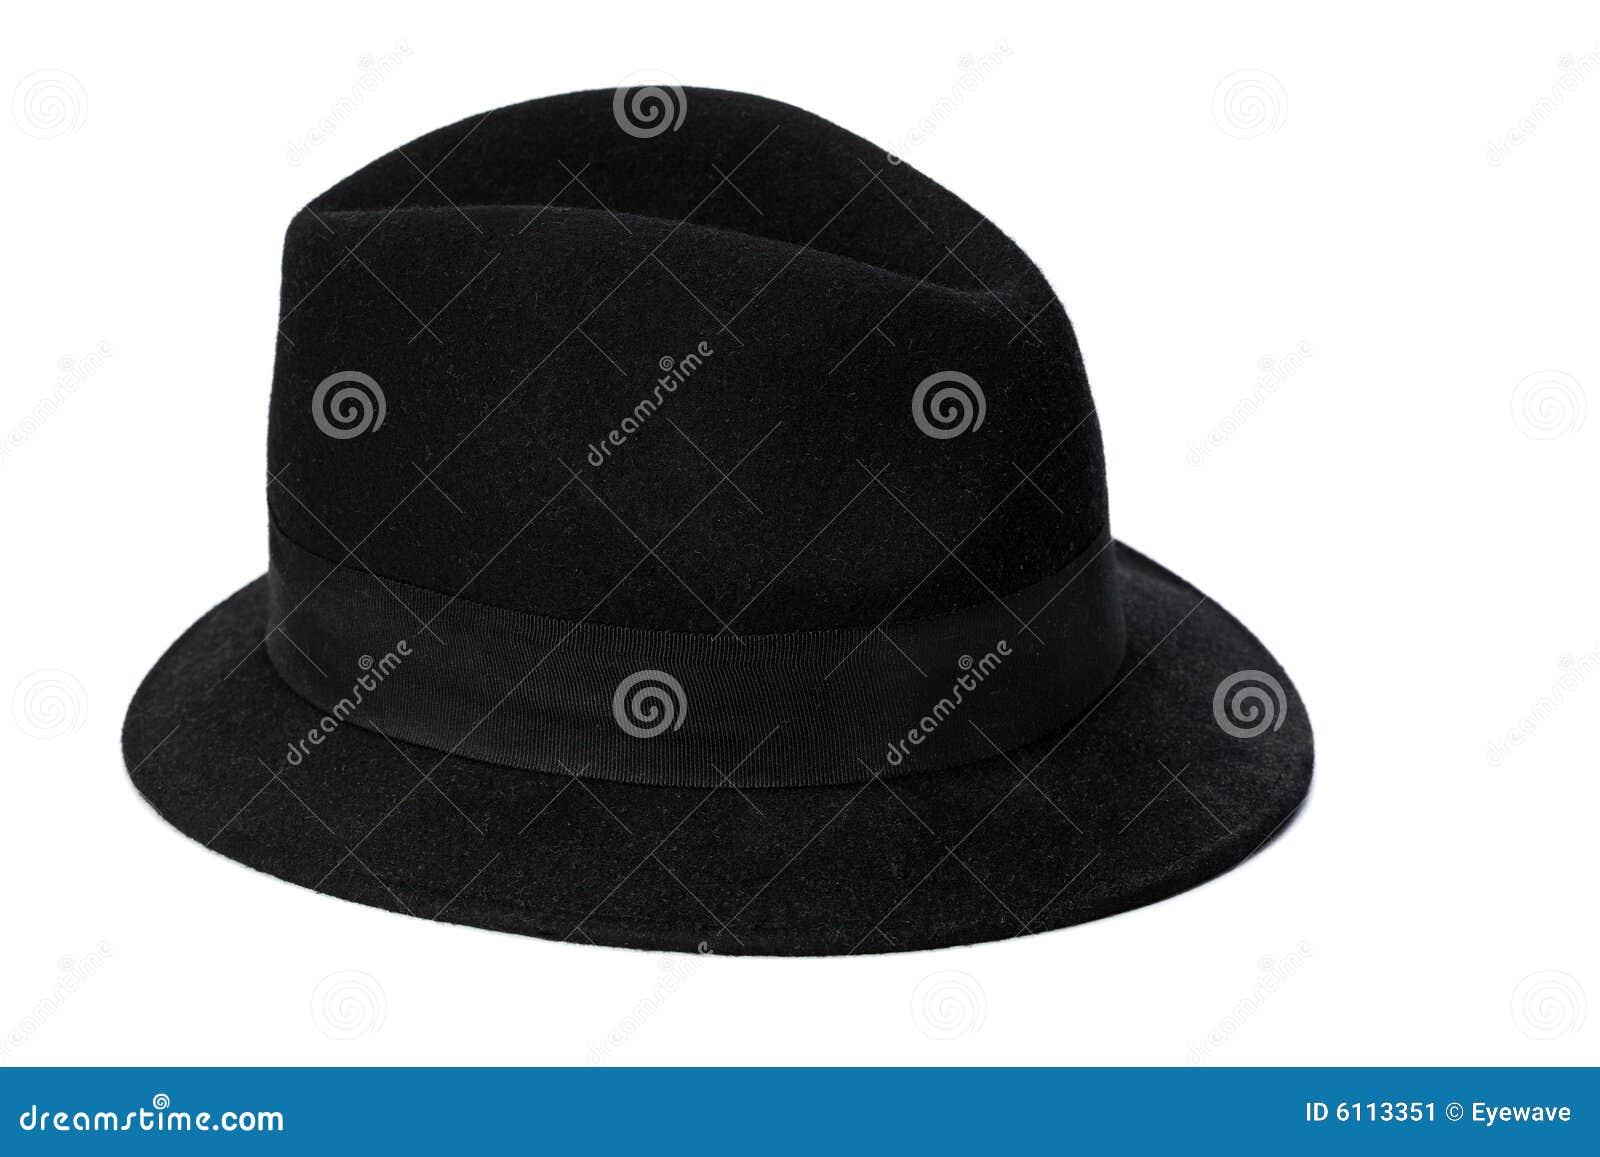 5a6fe9adc12a3 Black Soft Felt Hat Isolated Stock Image - Image of felt